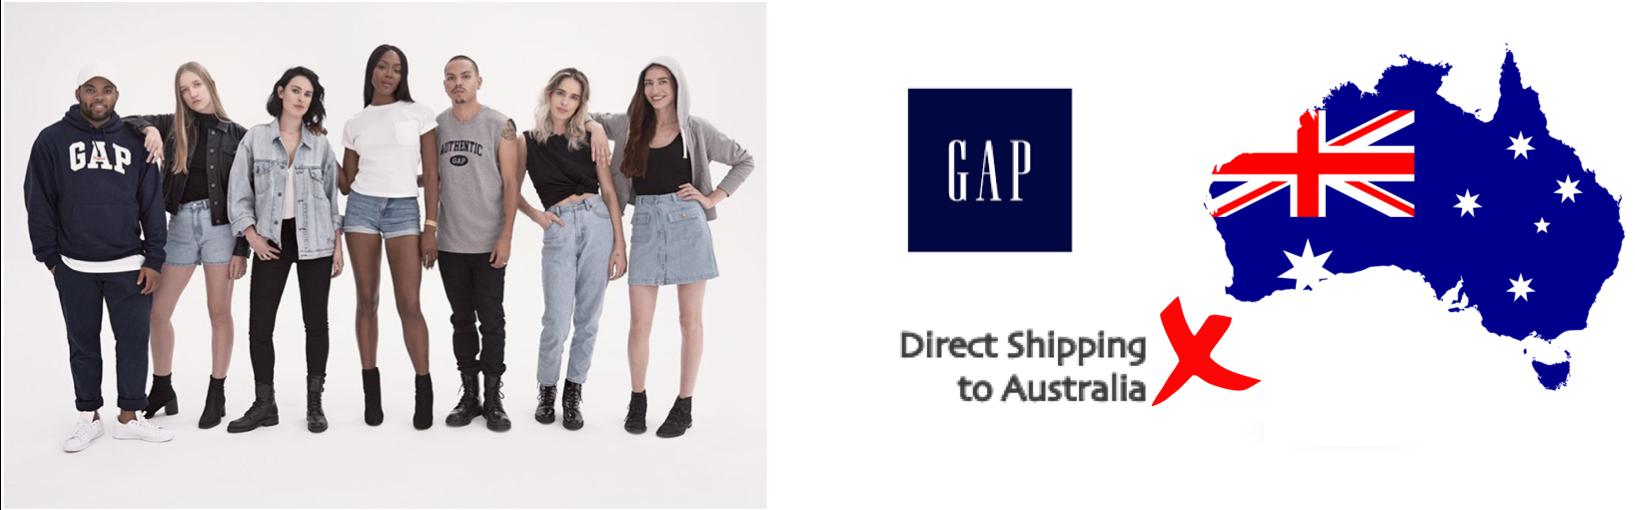 shop GAP ship to Australia